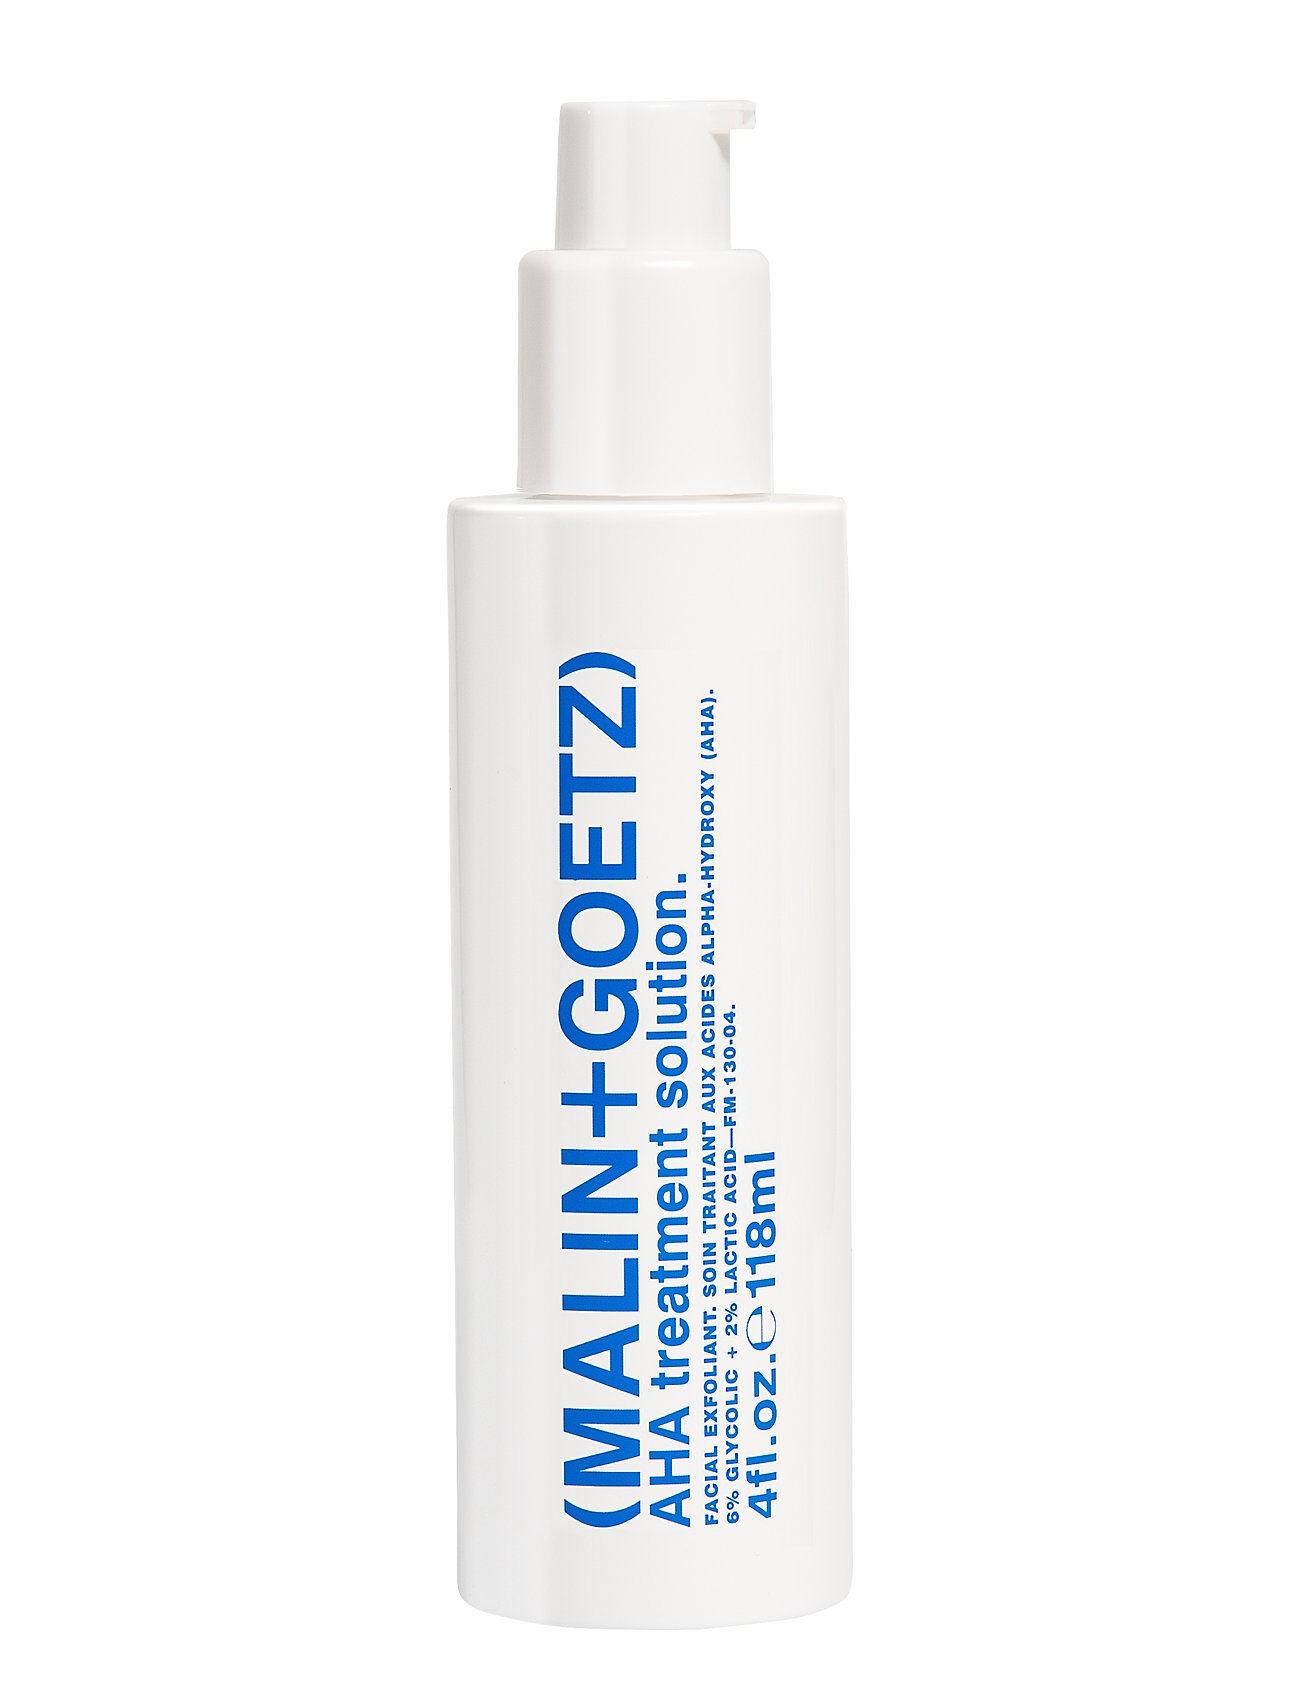 MALIN+GOETZ Aha Treatment Solution Kasvojen Ihonhoito Nude MALIN+GOETZ